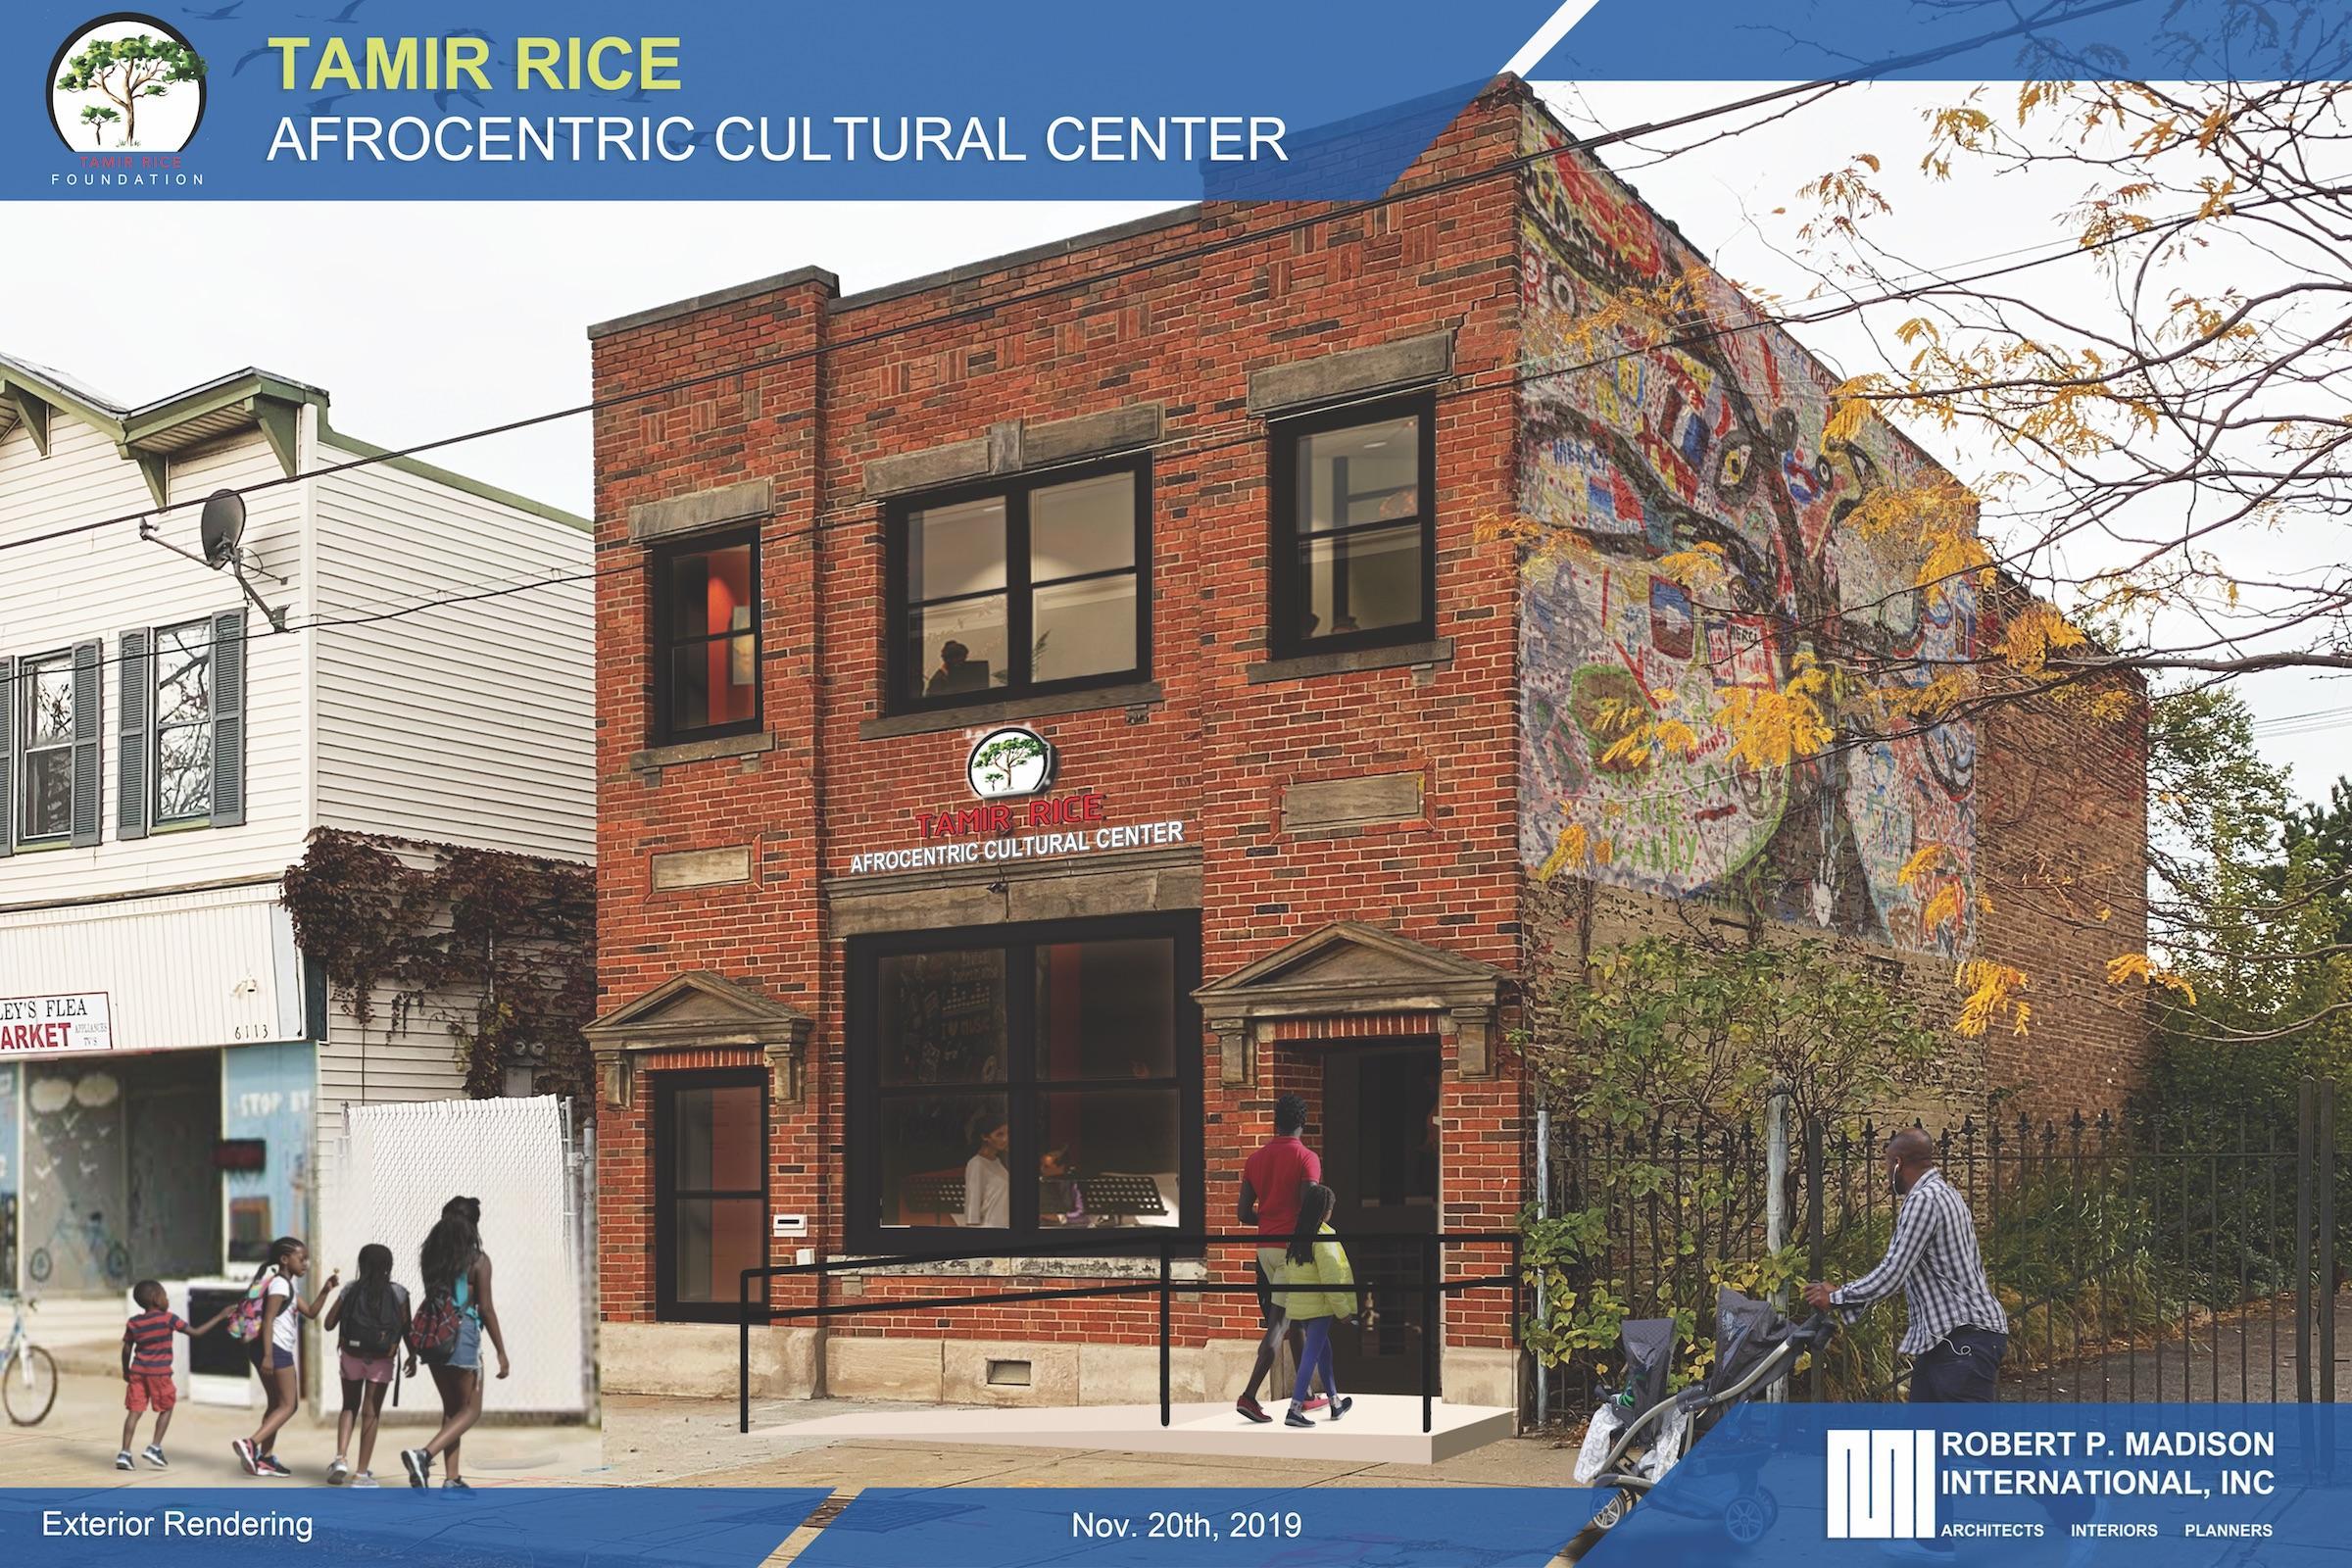 Introducing The Tamir Rice Afrocentric Cultural Center